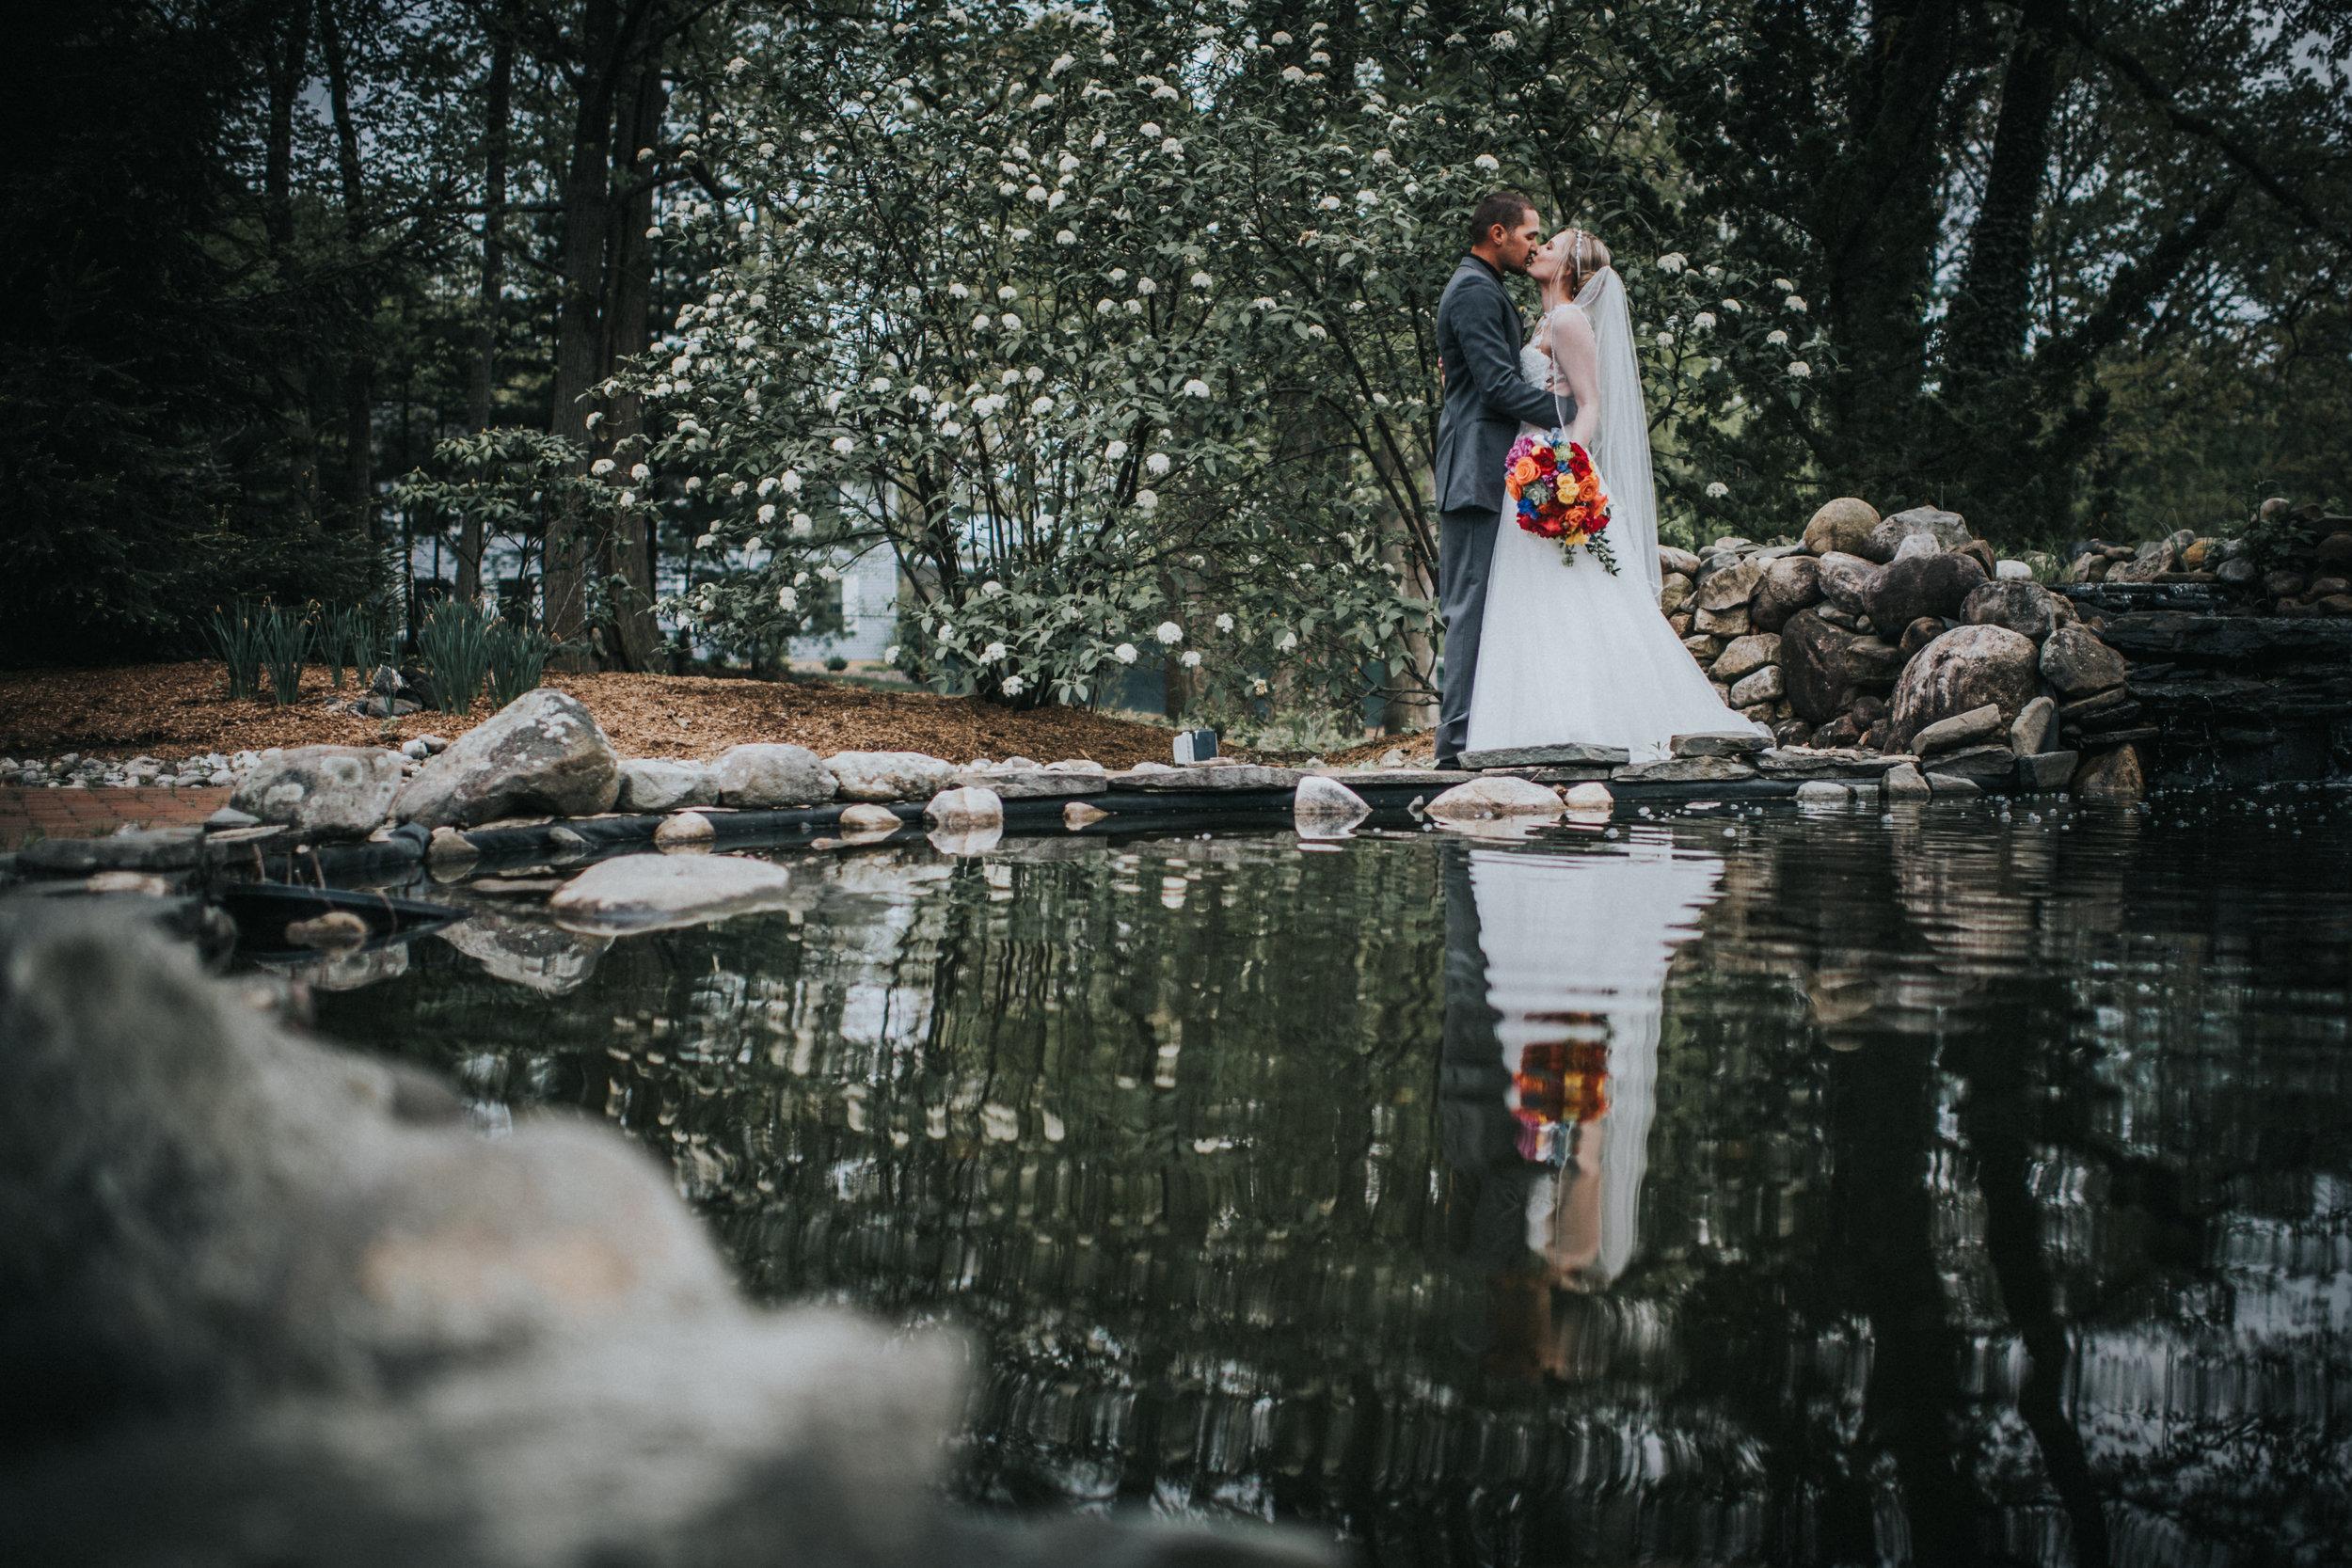 New-Jersey-Wedding-Photographer-Megan&Nick-BrideandGroom-27.jpg